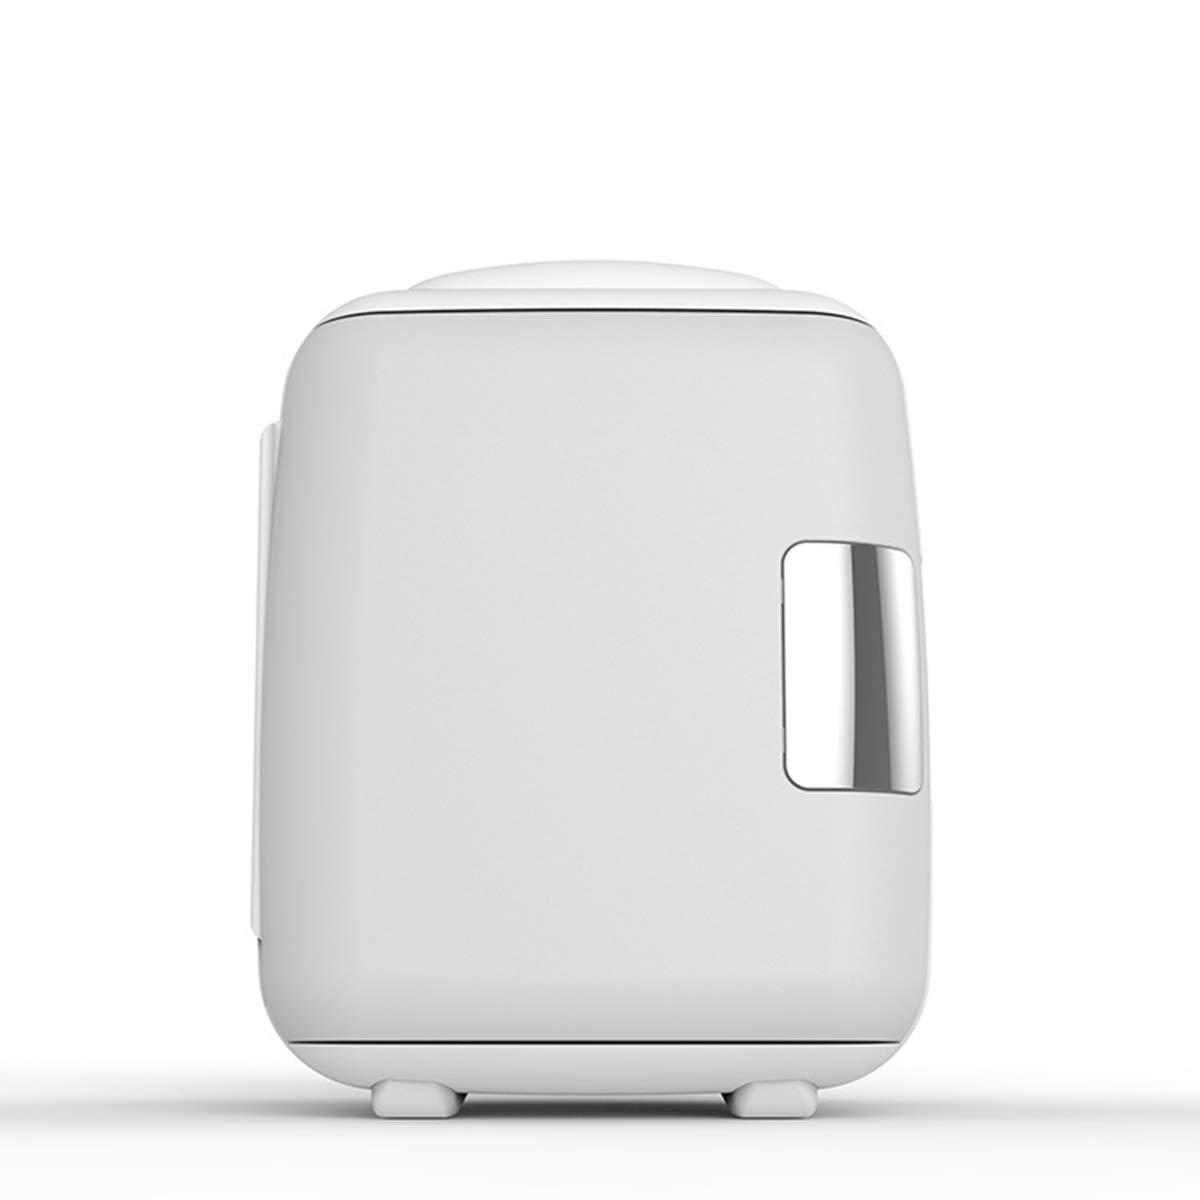 Dapang Compact & Portable Refrigerator Energy Star Single Door Mini Fridge with Freezer - Cools & Heats - AC & DC Power Cords,100% Freon-Free & Eco Friendly,Silver